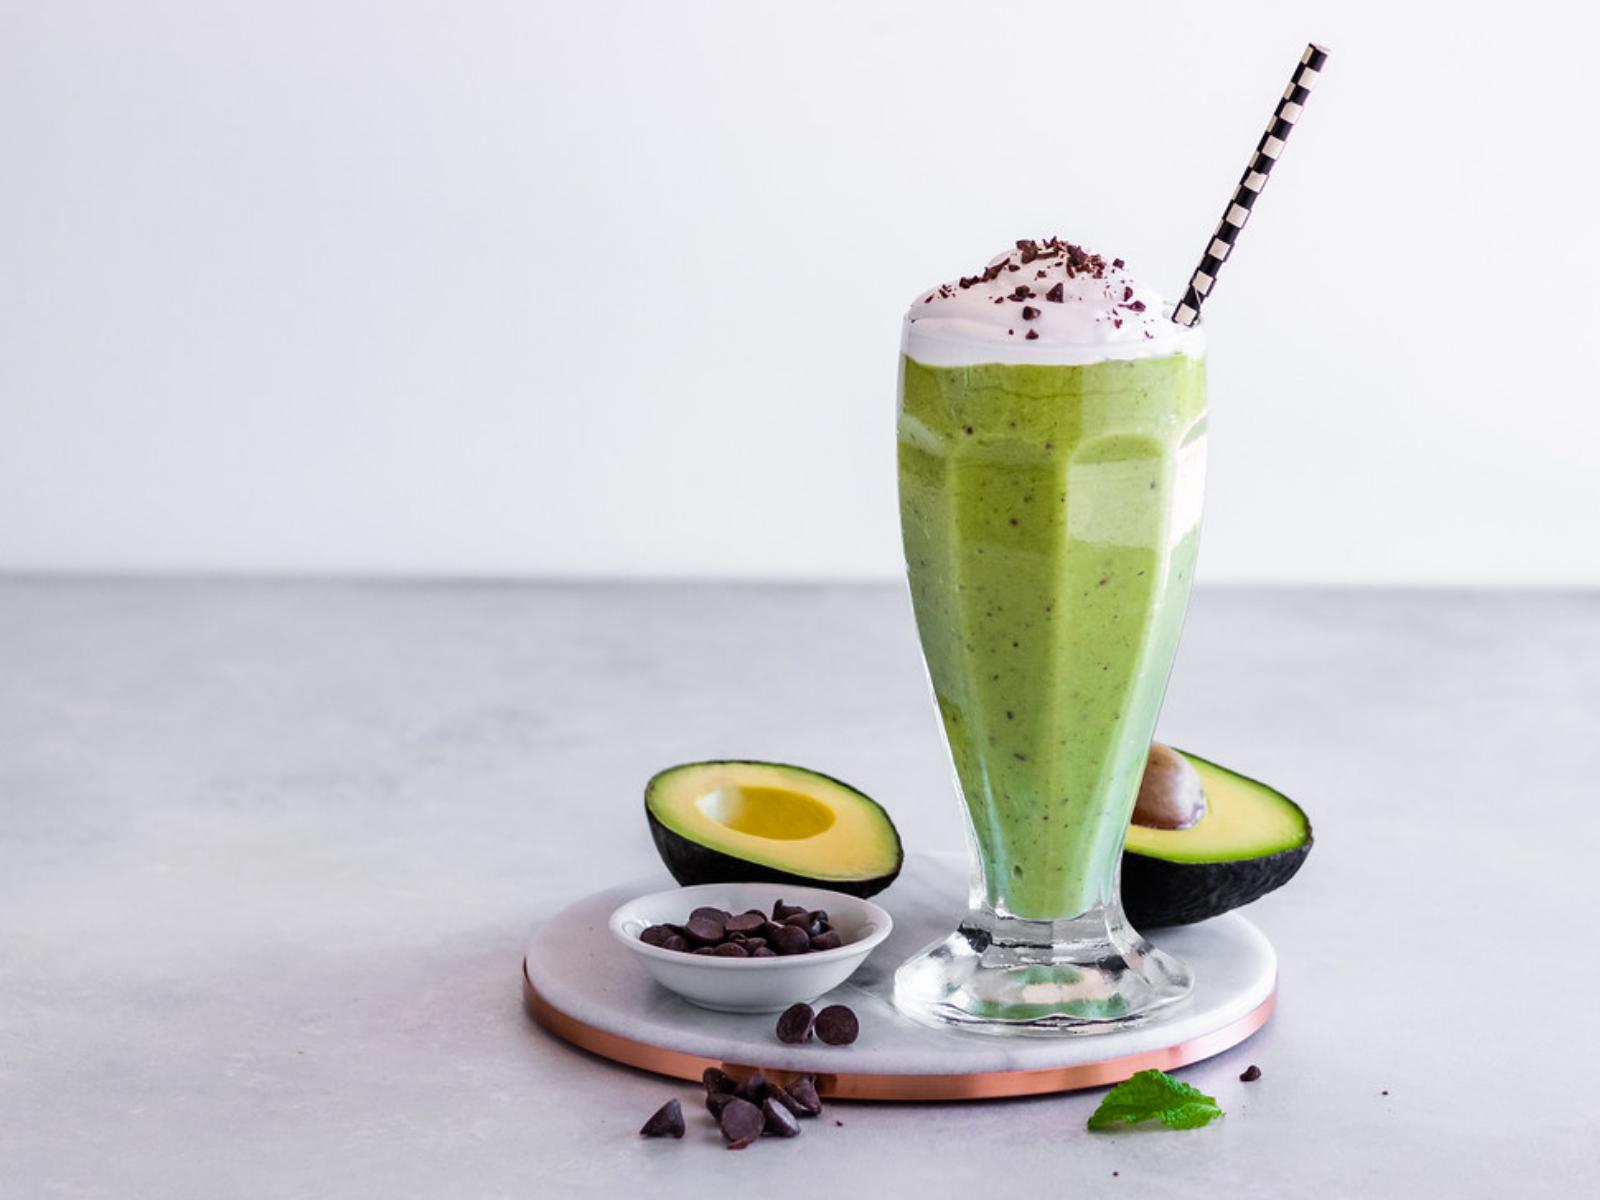 Mint Chip Avocado Milkshake Vegan In 2020 Avocado Milkshake Vegan Mints Mango Smoothie Healthy